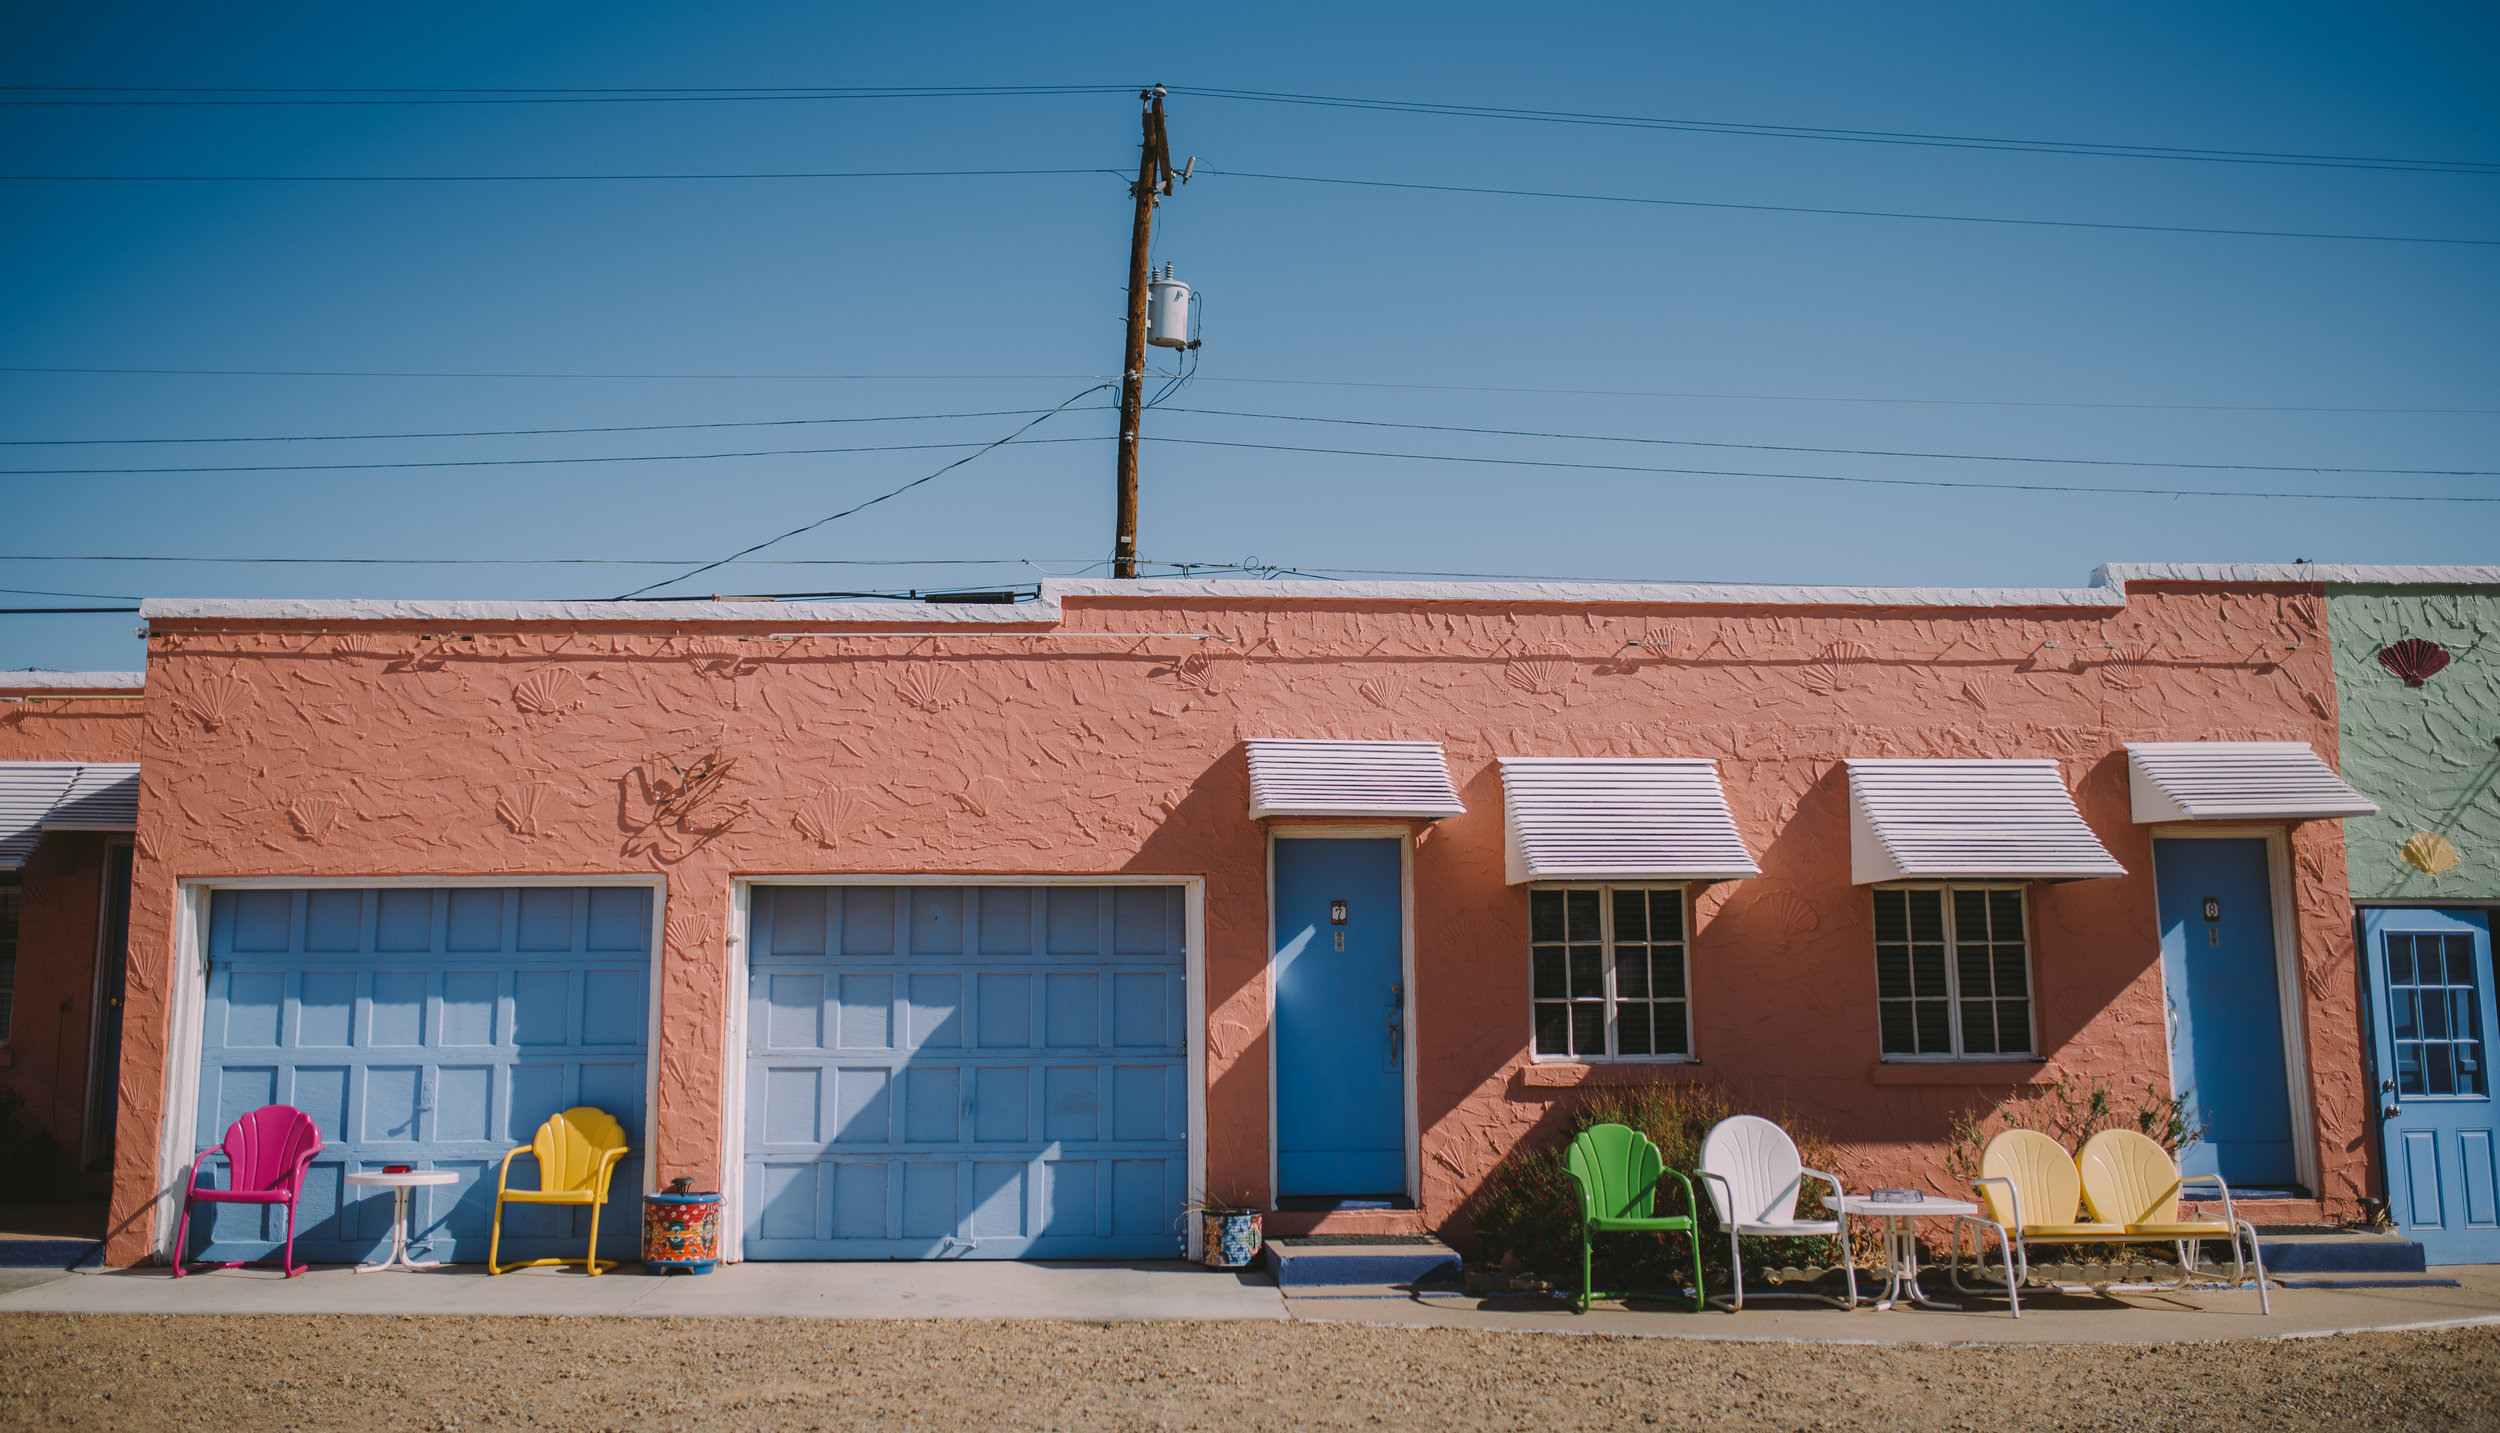 Samantha_NewMexico_RoadTrip_April2018_Senior Photography In Phoenix Arizona_ArizonaSeniorPhotographer_SamanthaRosePhotography_-1-3.jpg